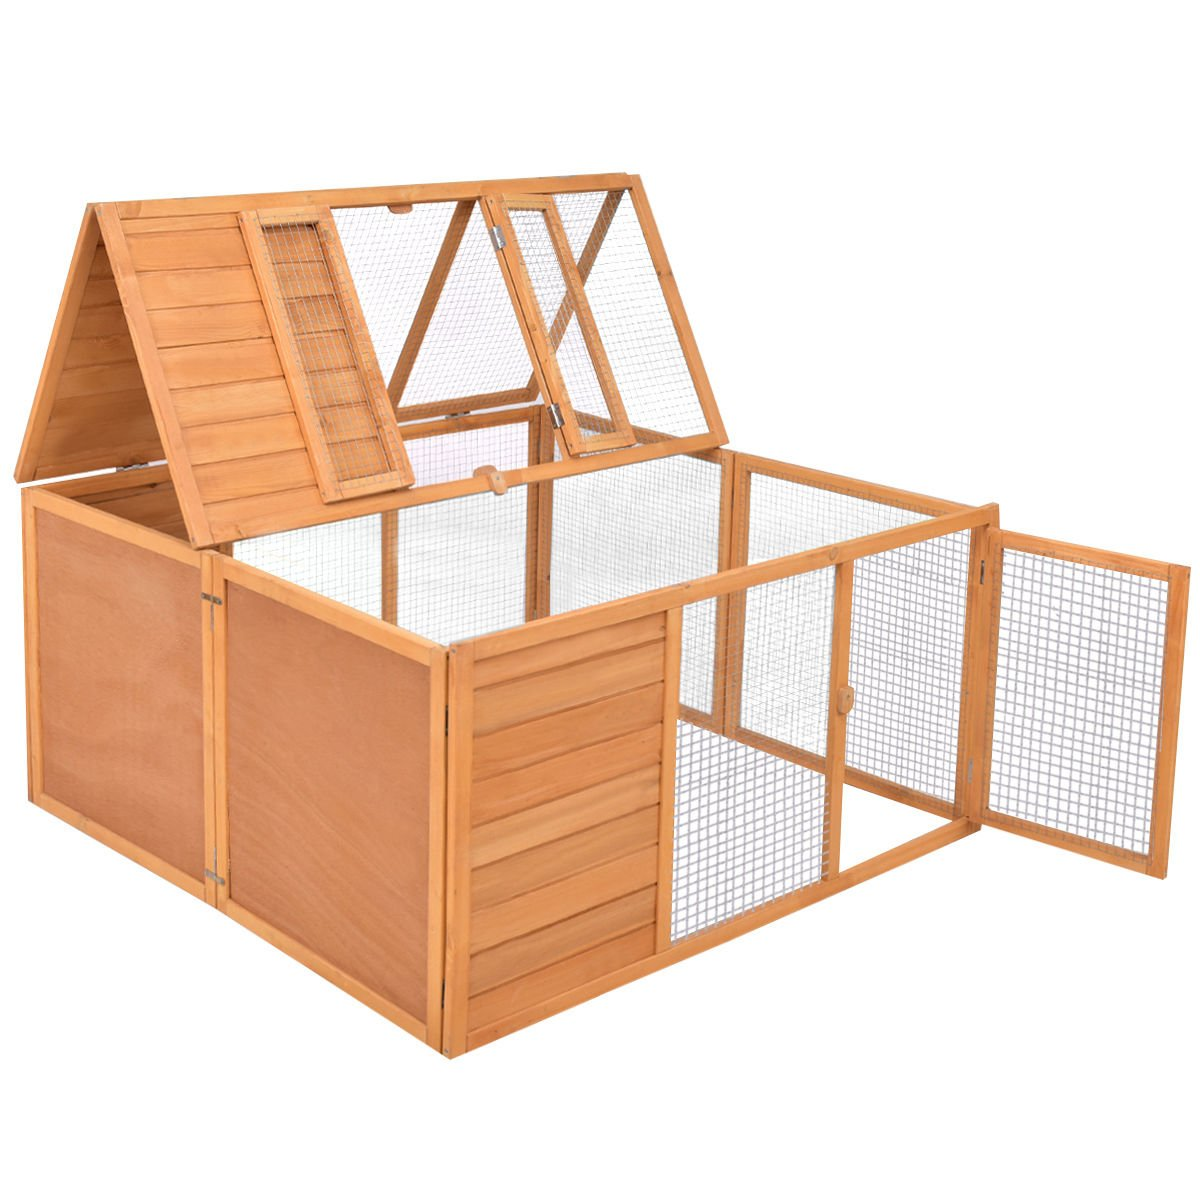 Tangkula Chicken Coop, Wooden Garden Backyard Bunny Chicken Rabbit Duck Small Animals Cage with 2 Doors,Hen House (47'') by Tangkula